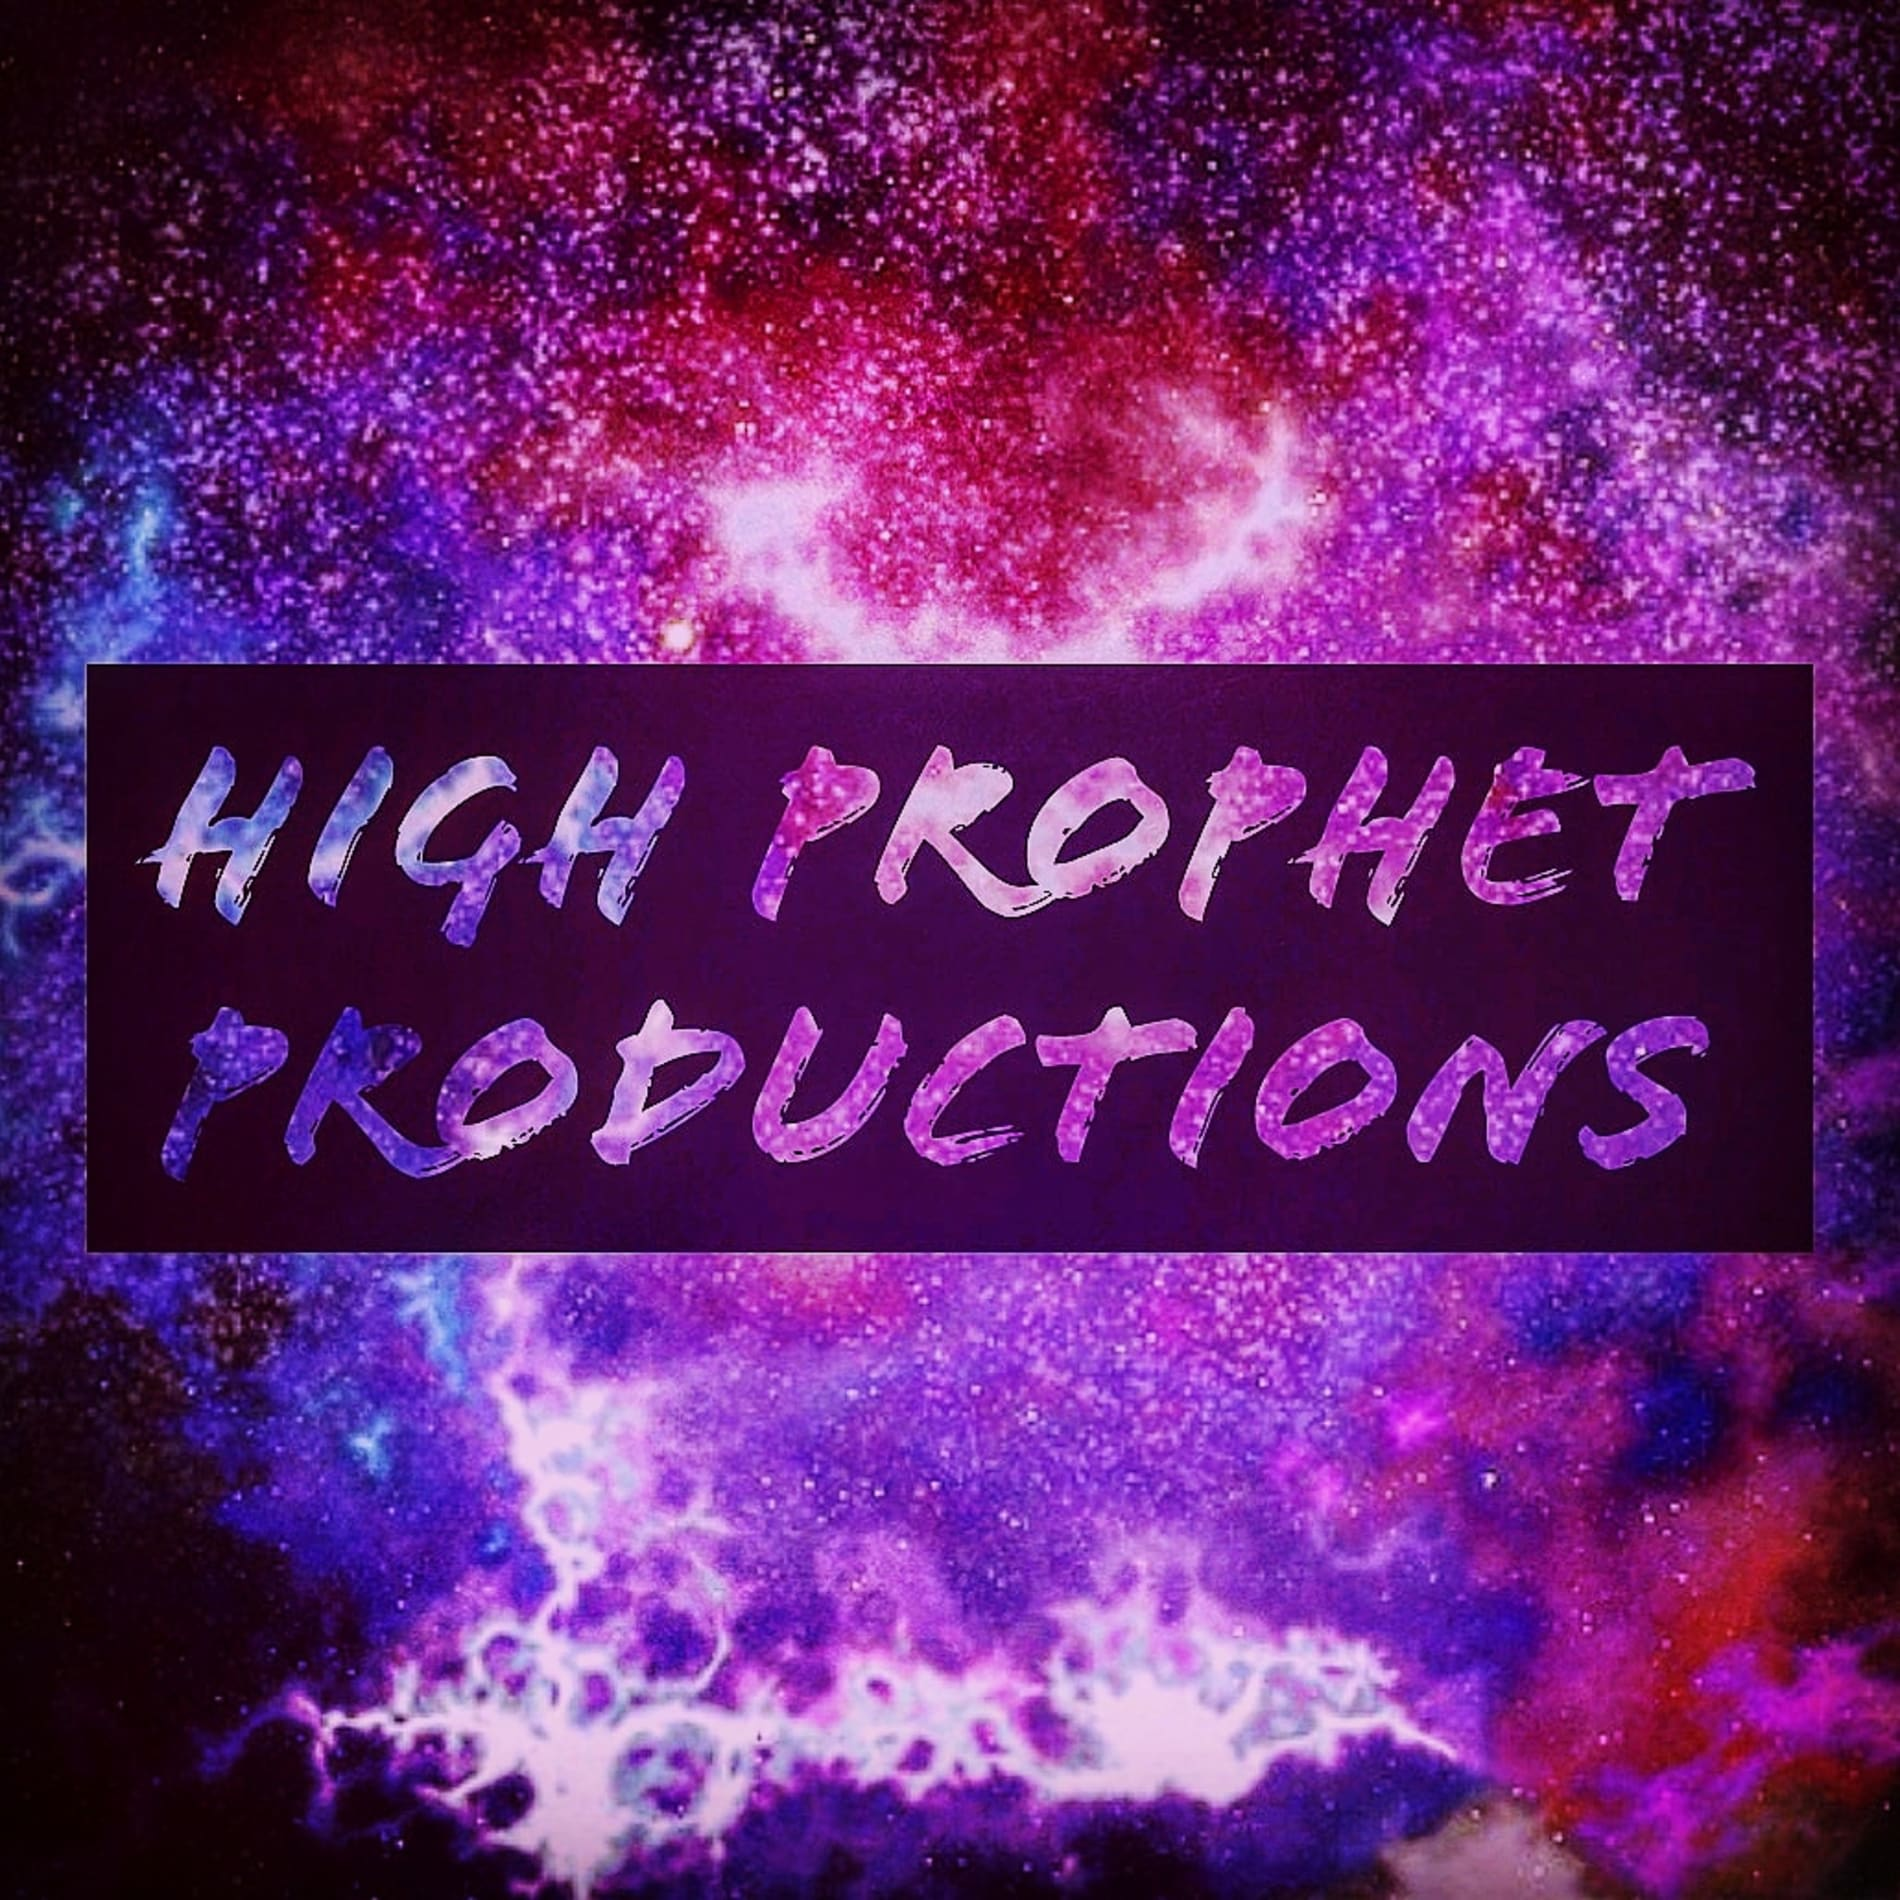 High Prophet Productions